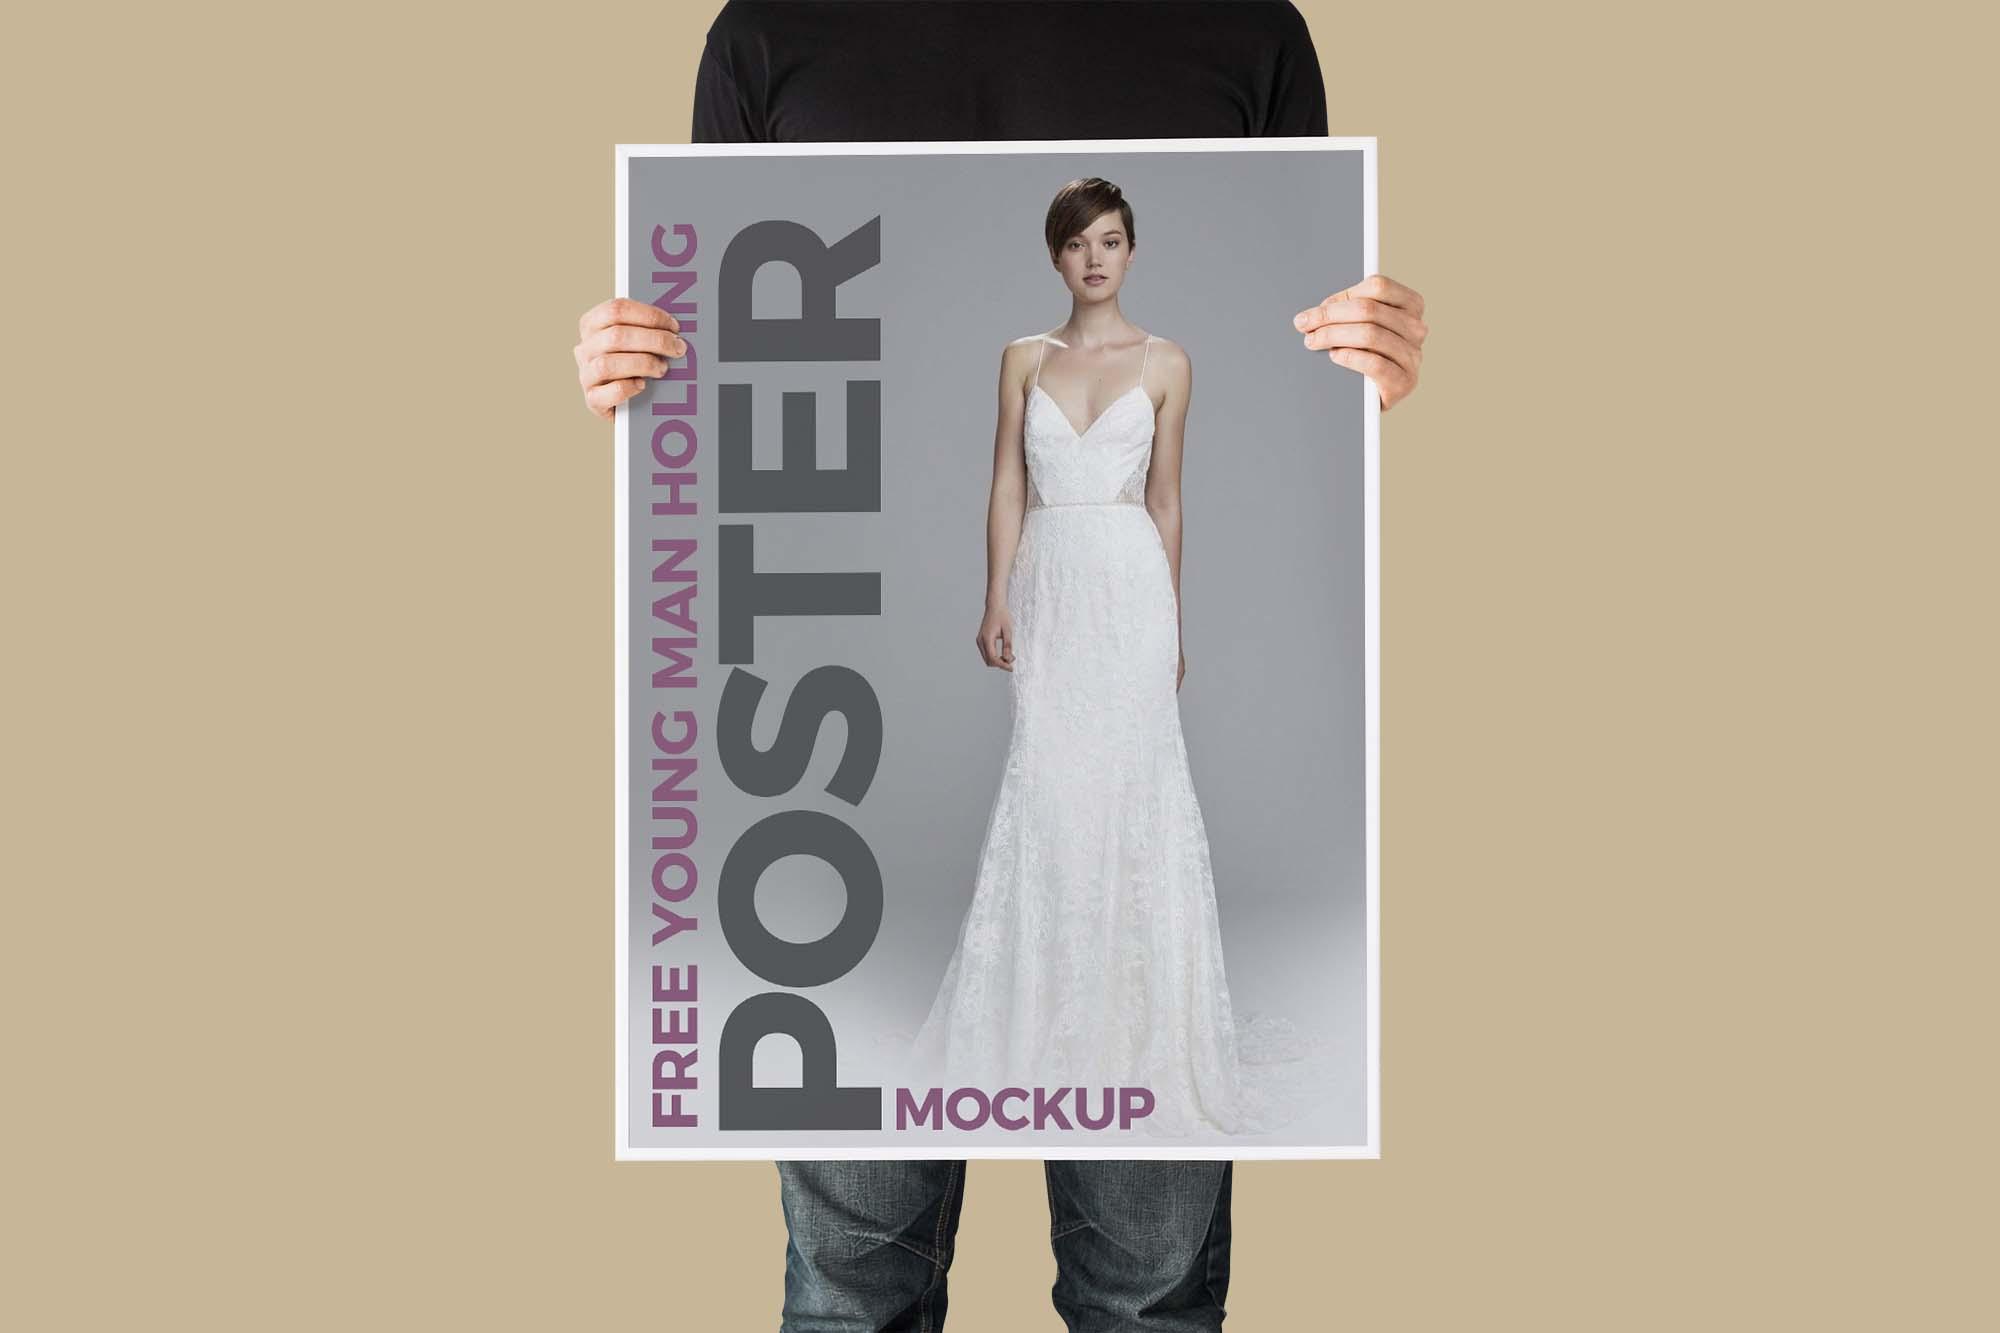 Man Holding Poster Mockup 2